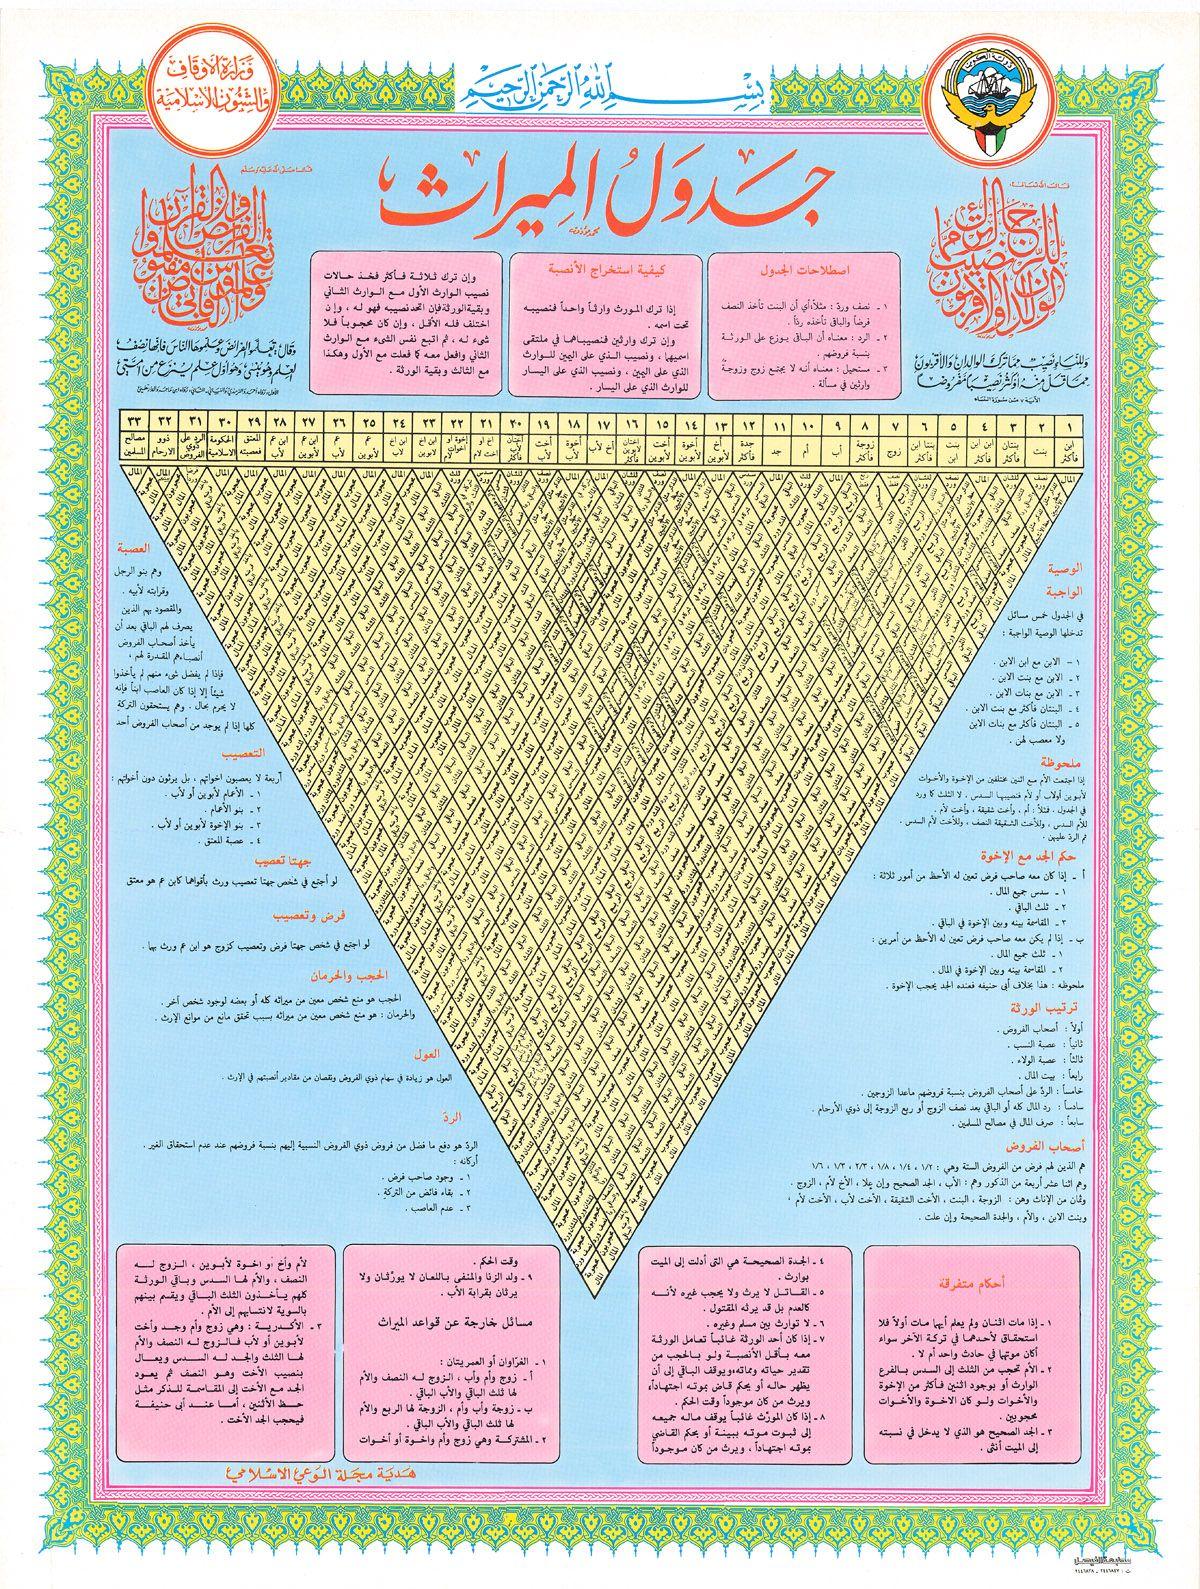 جدول الميراث Jpg 1200 1589 Islam Facts Islam Beliefs Islamic Posters